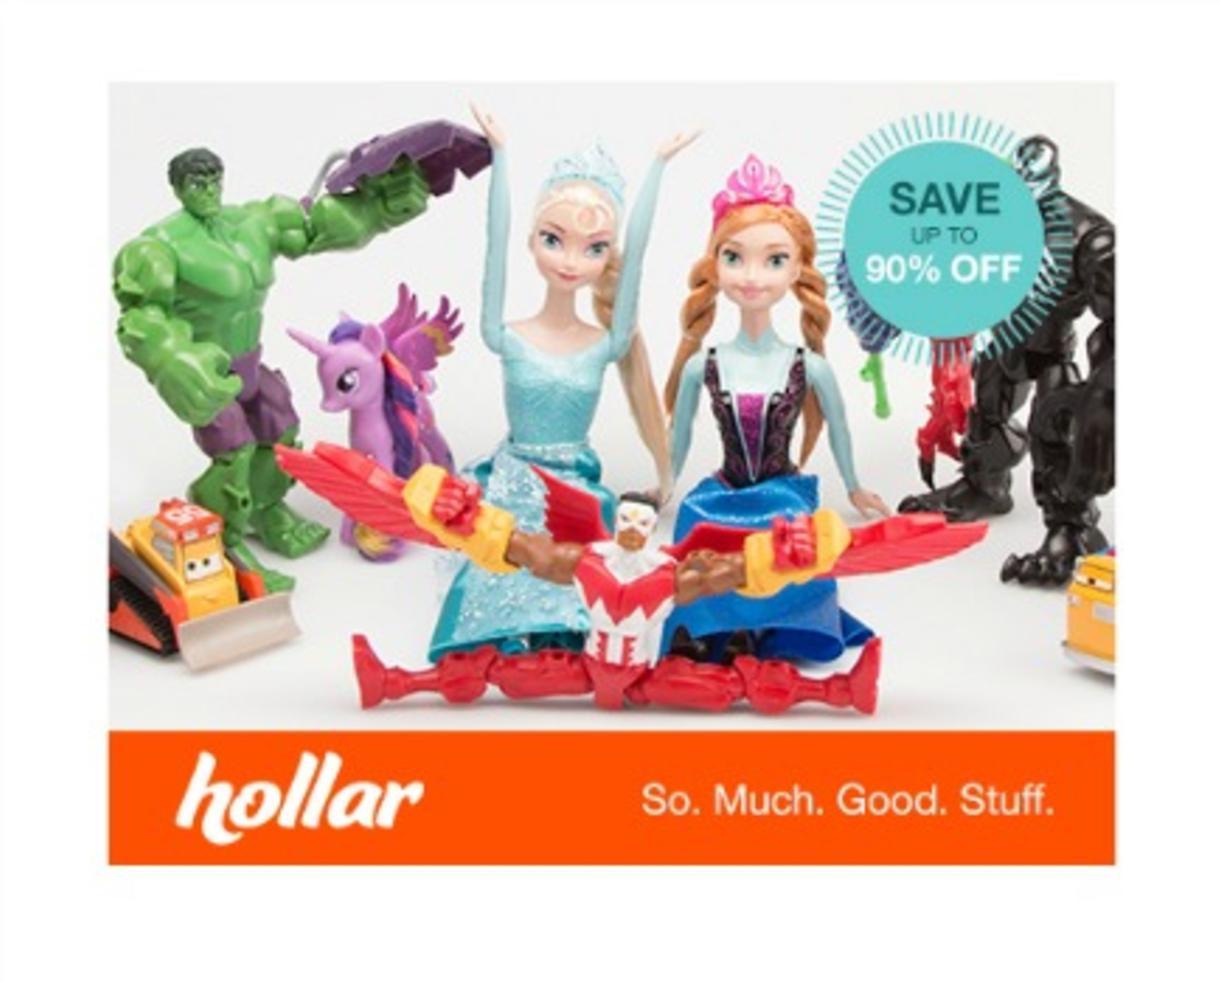 hollar free shipping